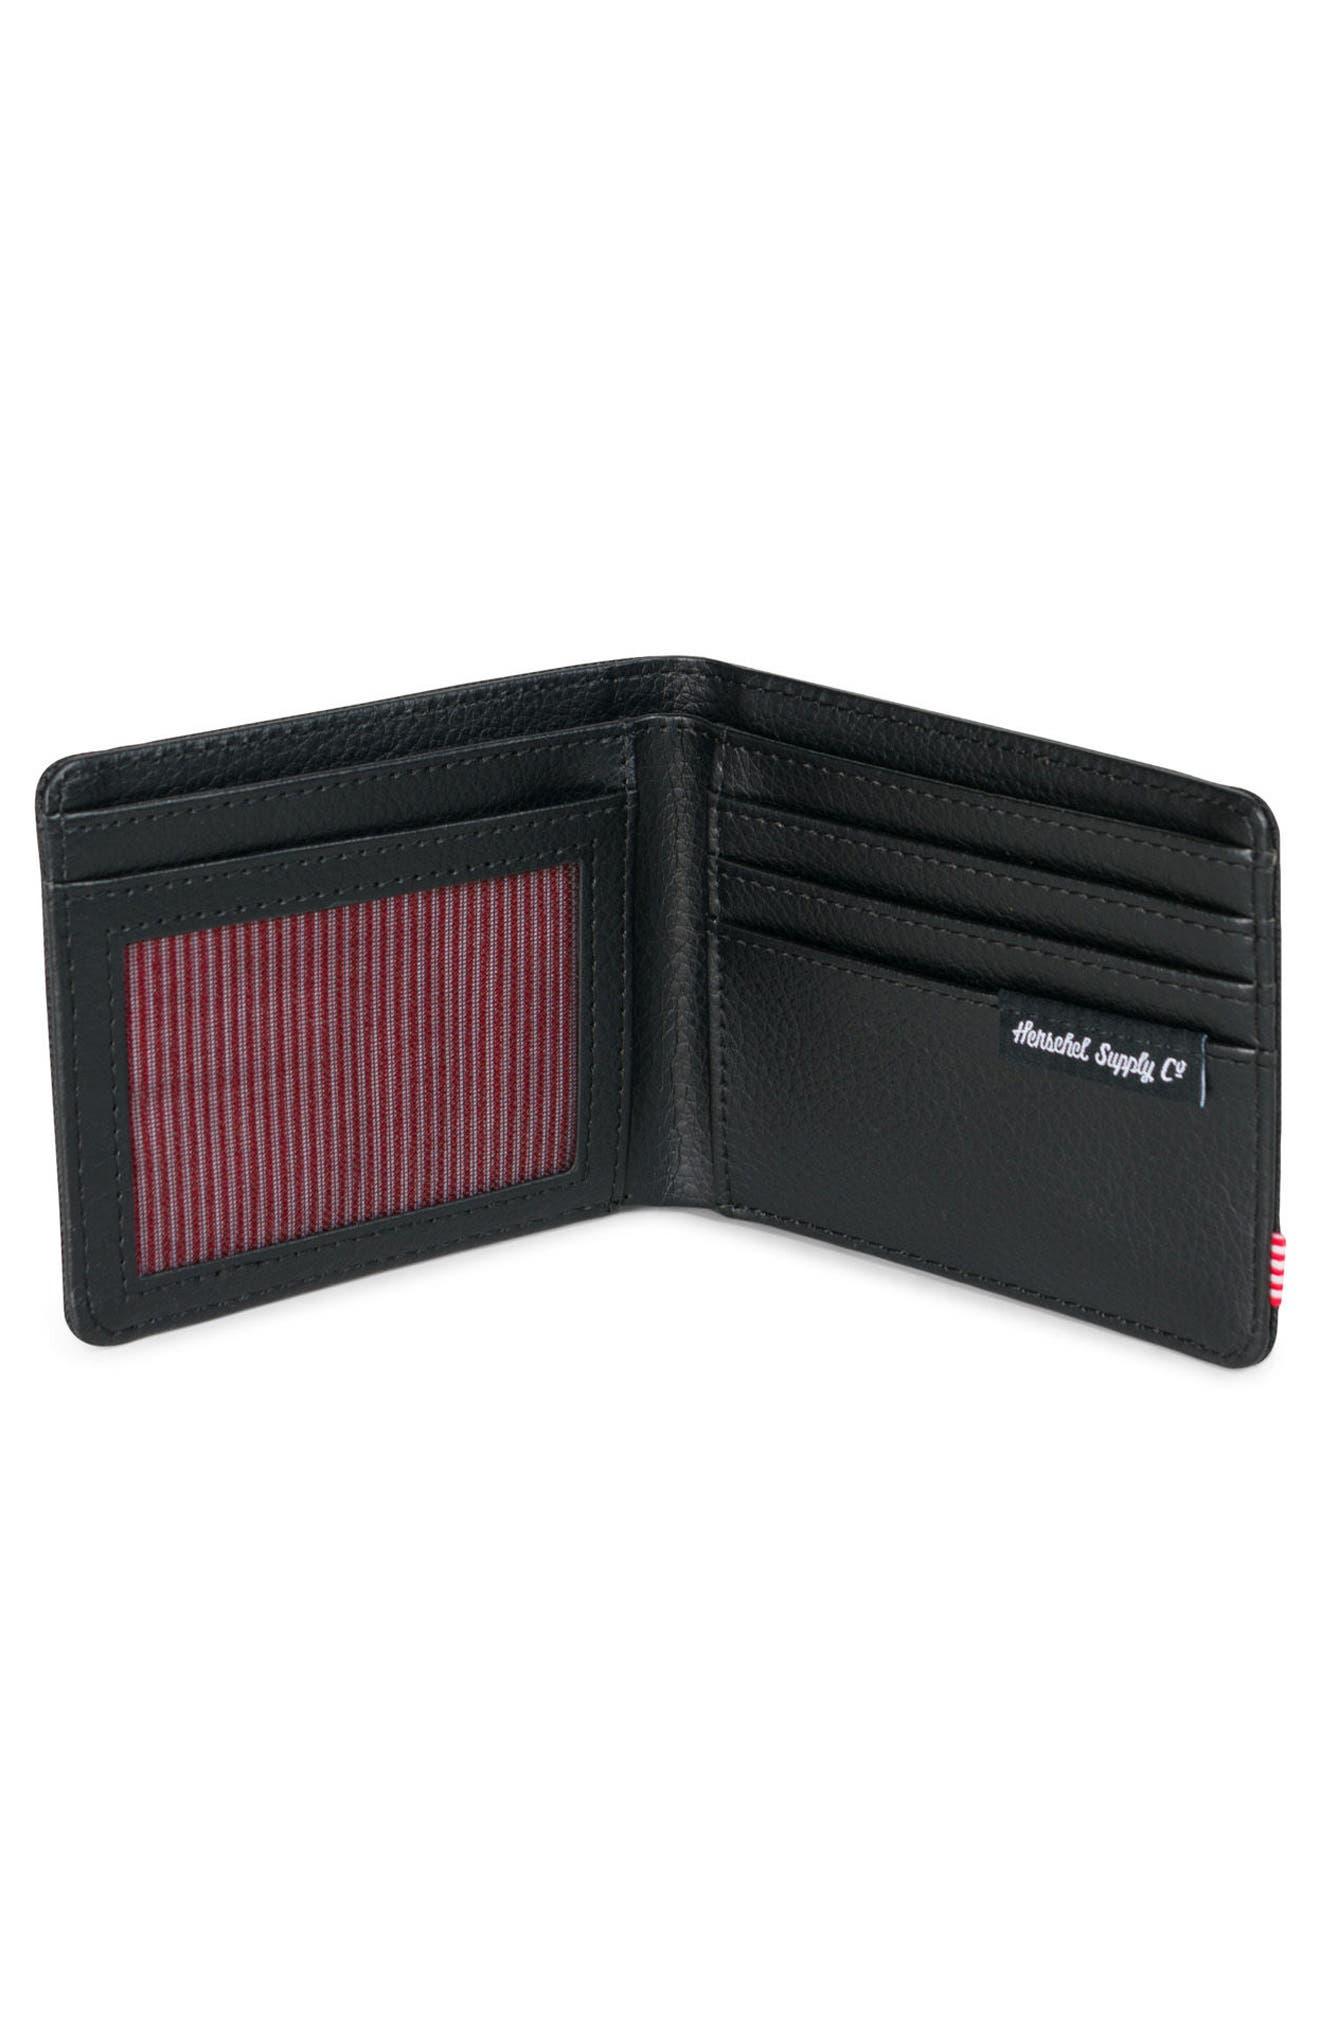 Hank RFID Wallet,                             Alternate thumbnail 2, color,                             Black Gridlock/ Black Leather